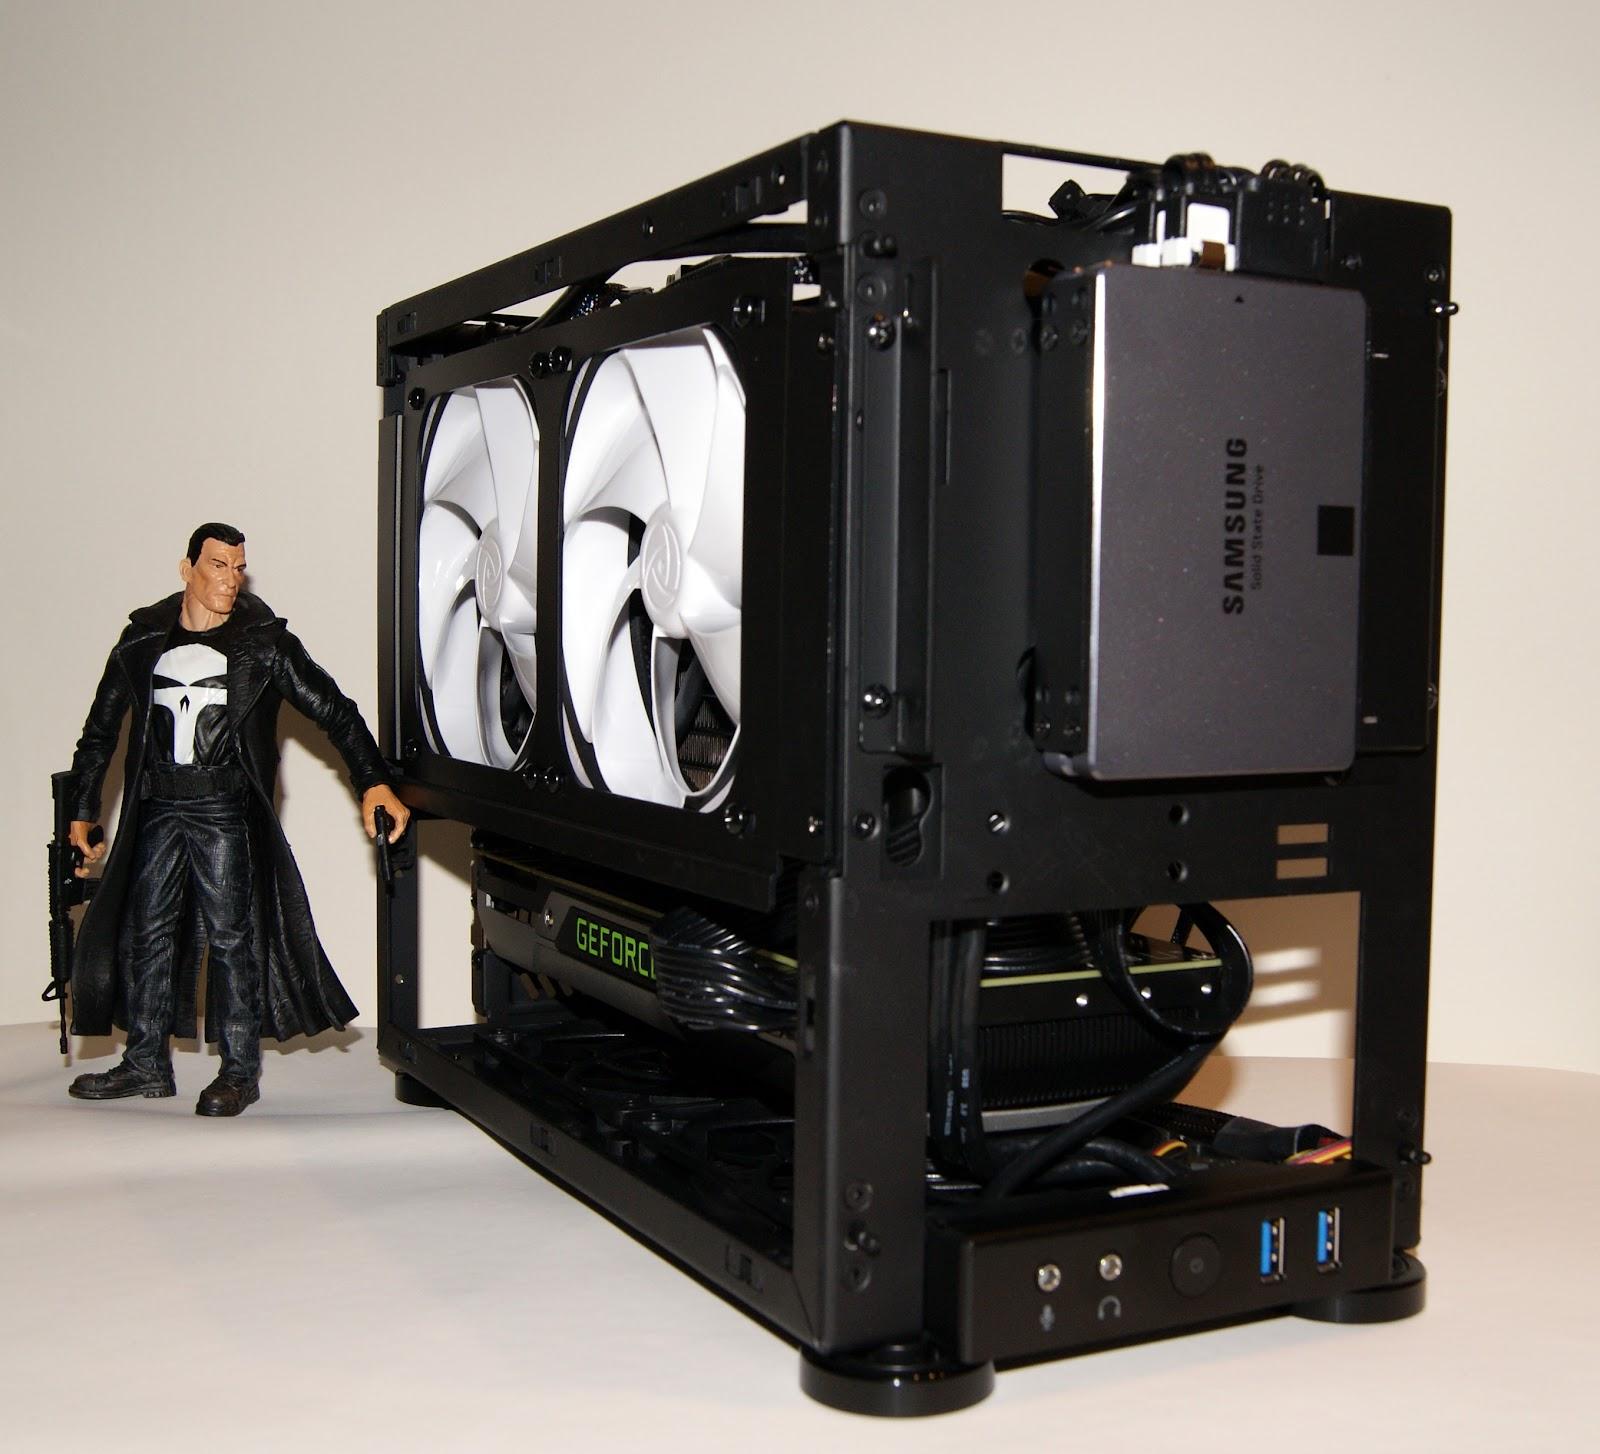 Formato SFF, placa Mini-ITX, fuente SFX, todo reducido excepto su potencia